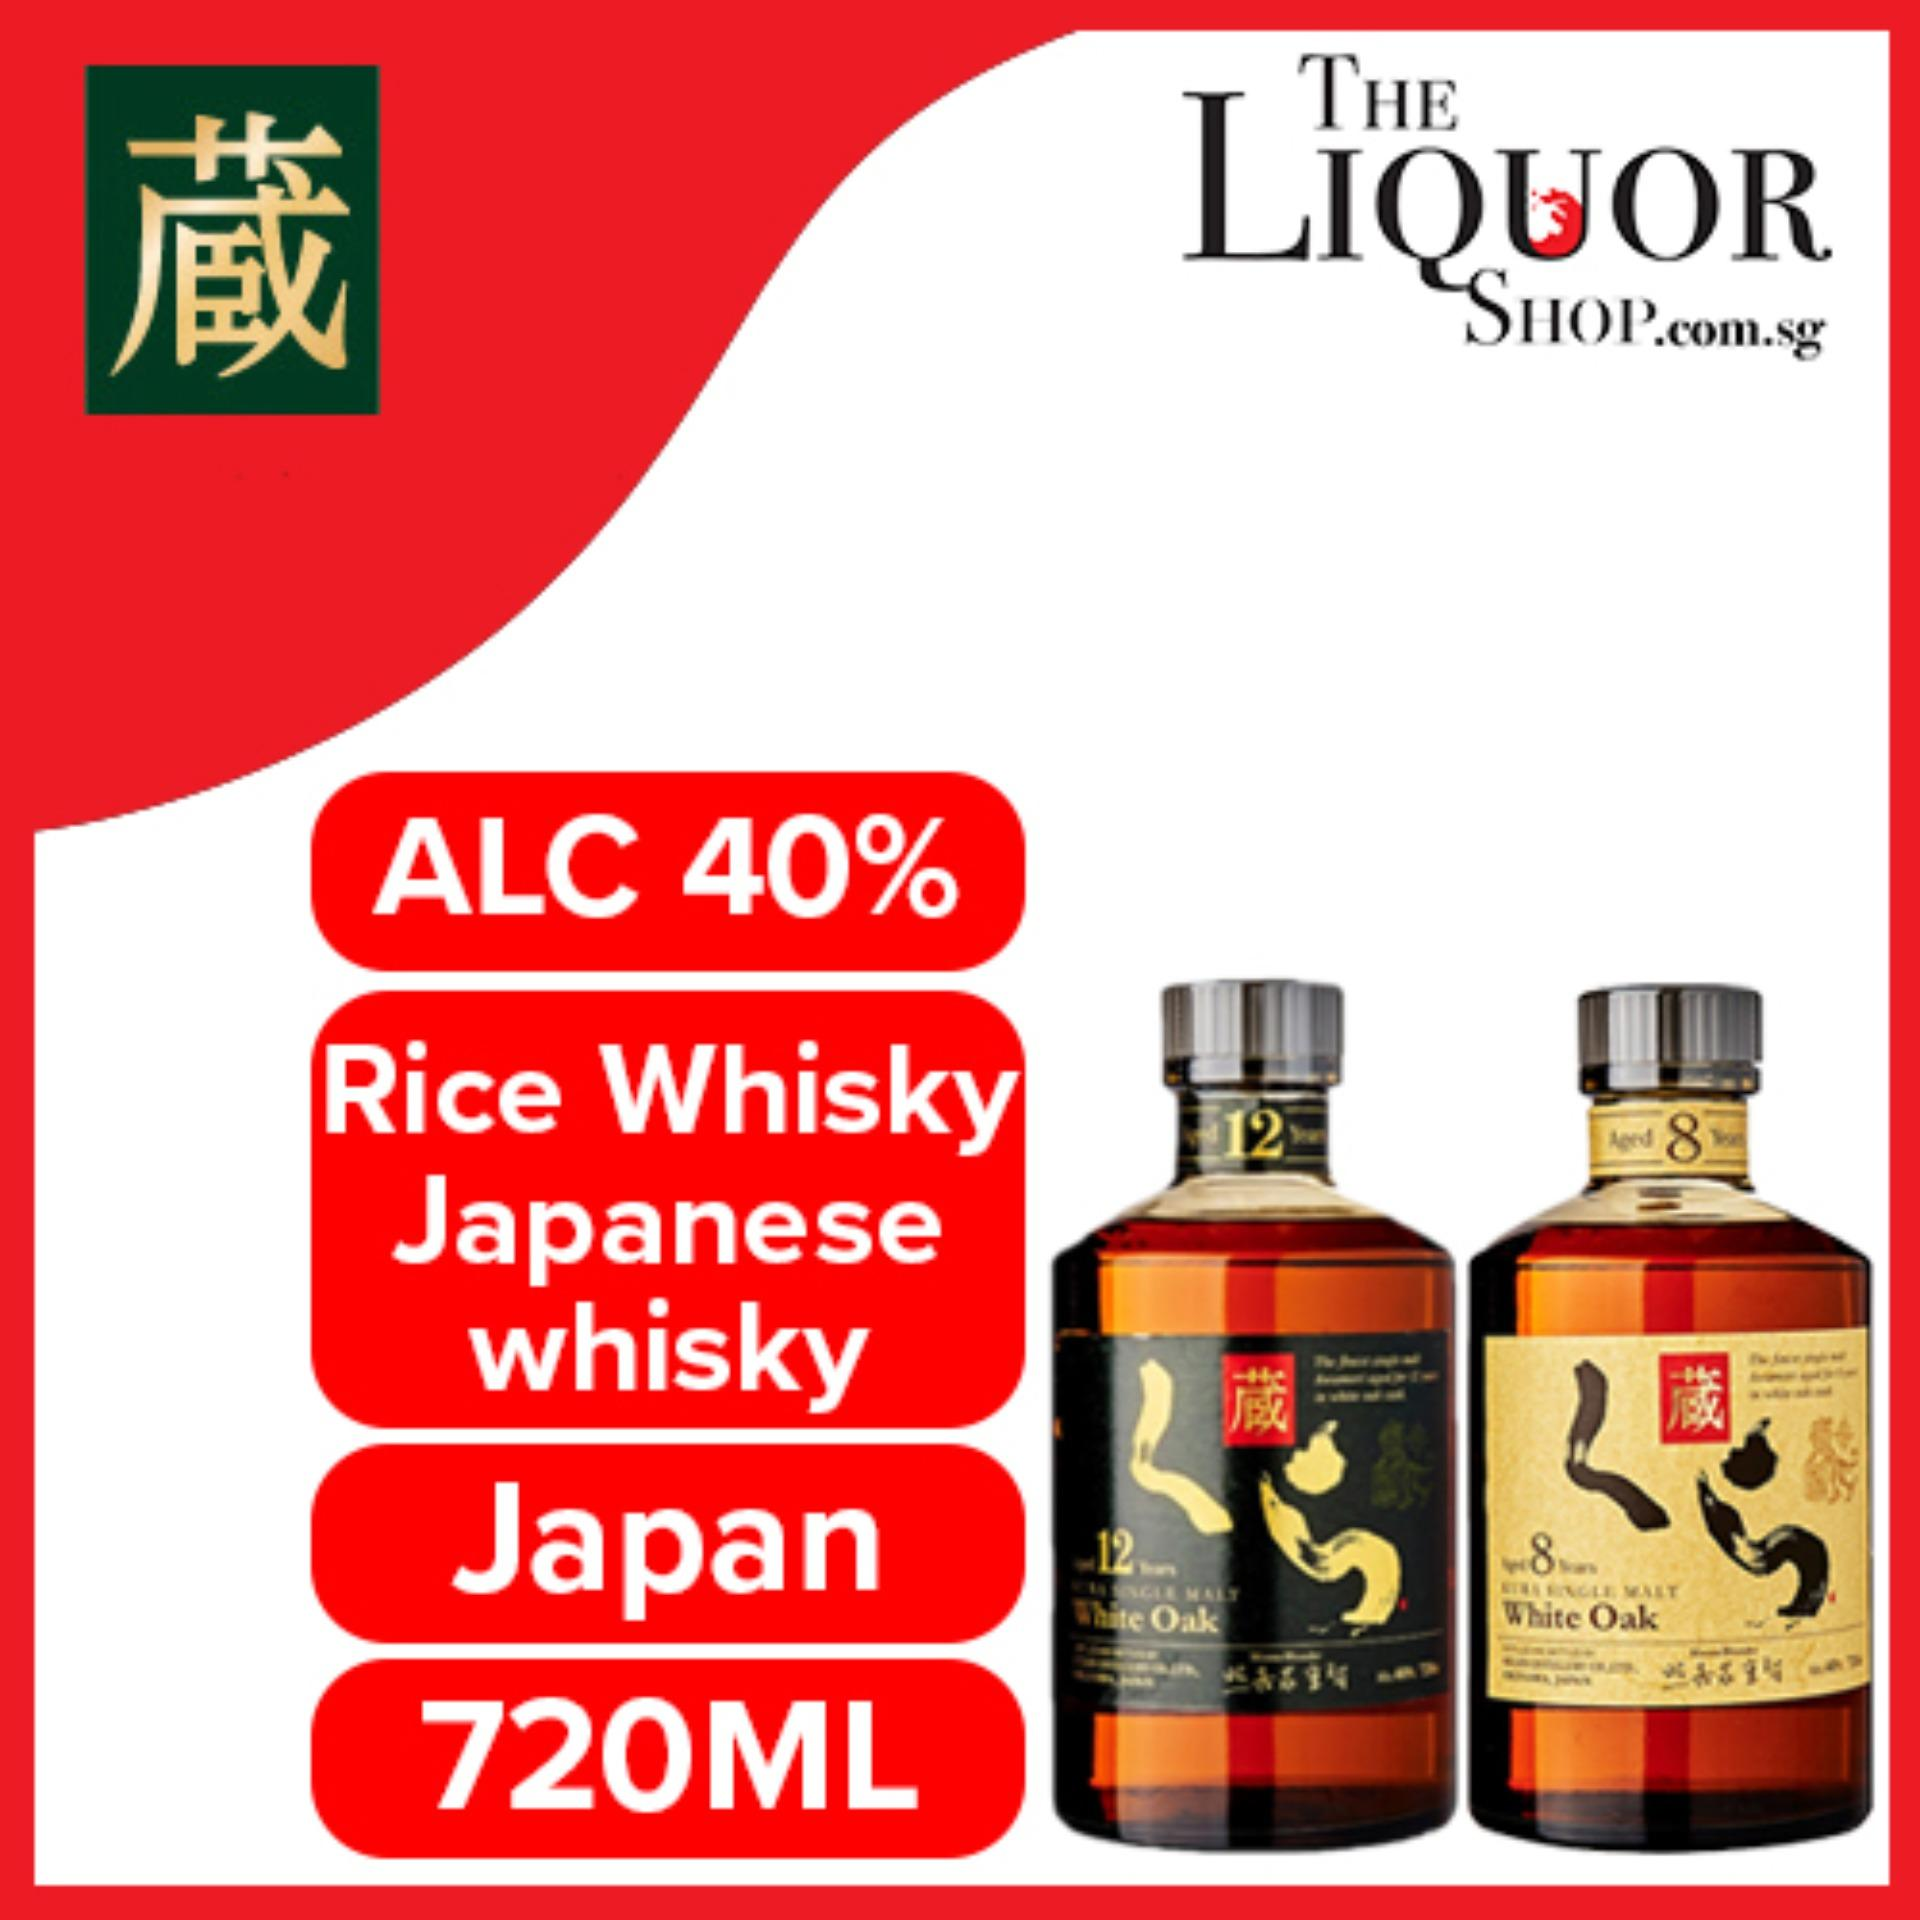 Bundle Kura 12 Years Old Awamori Rice Whisky 720ml + Kura 8 Years Old Awamori Rice Whisky 720ml By The Liquor Shop.